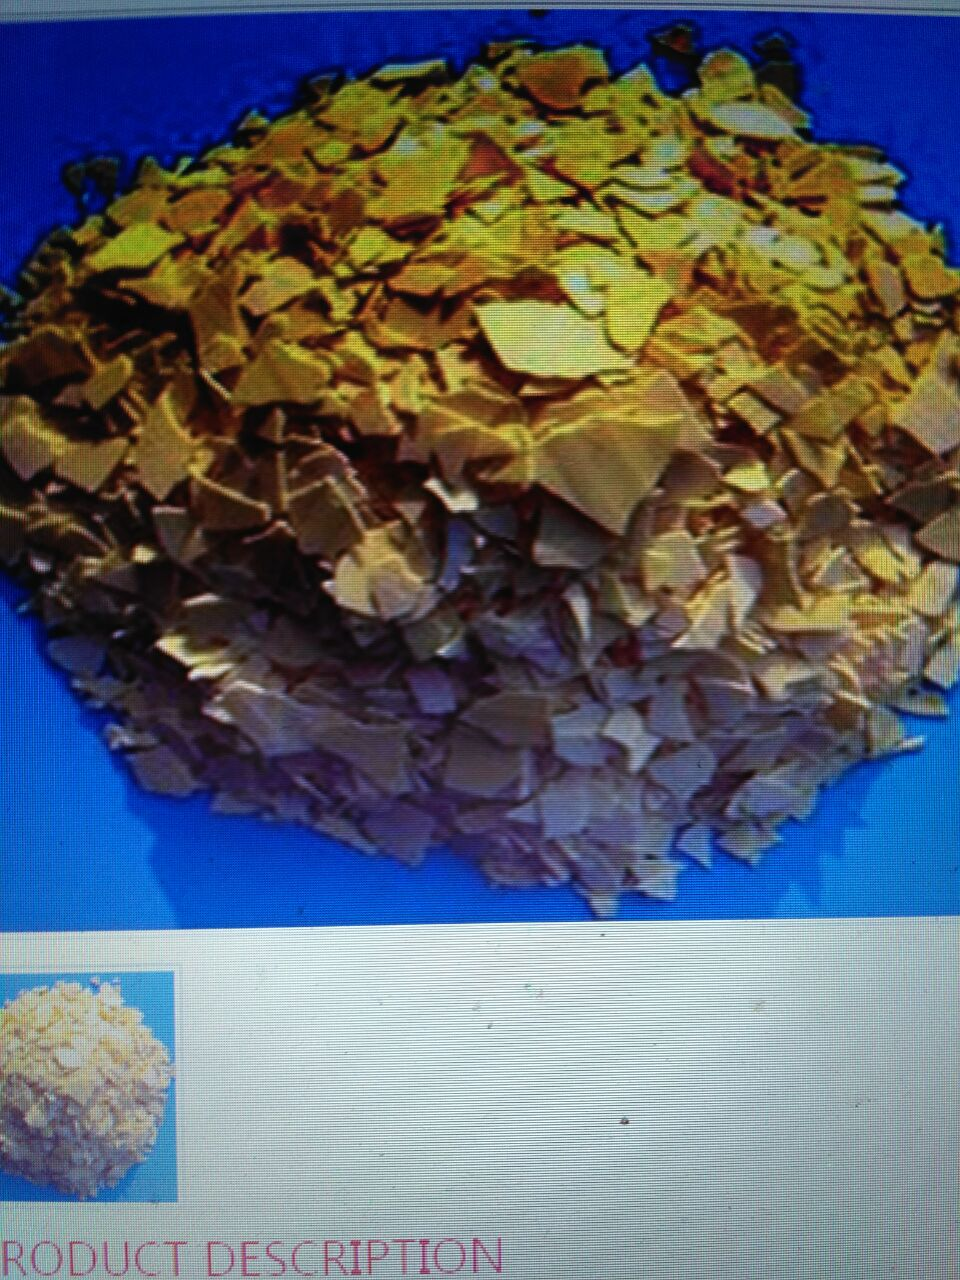 Sodium sulphide yellow flake